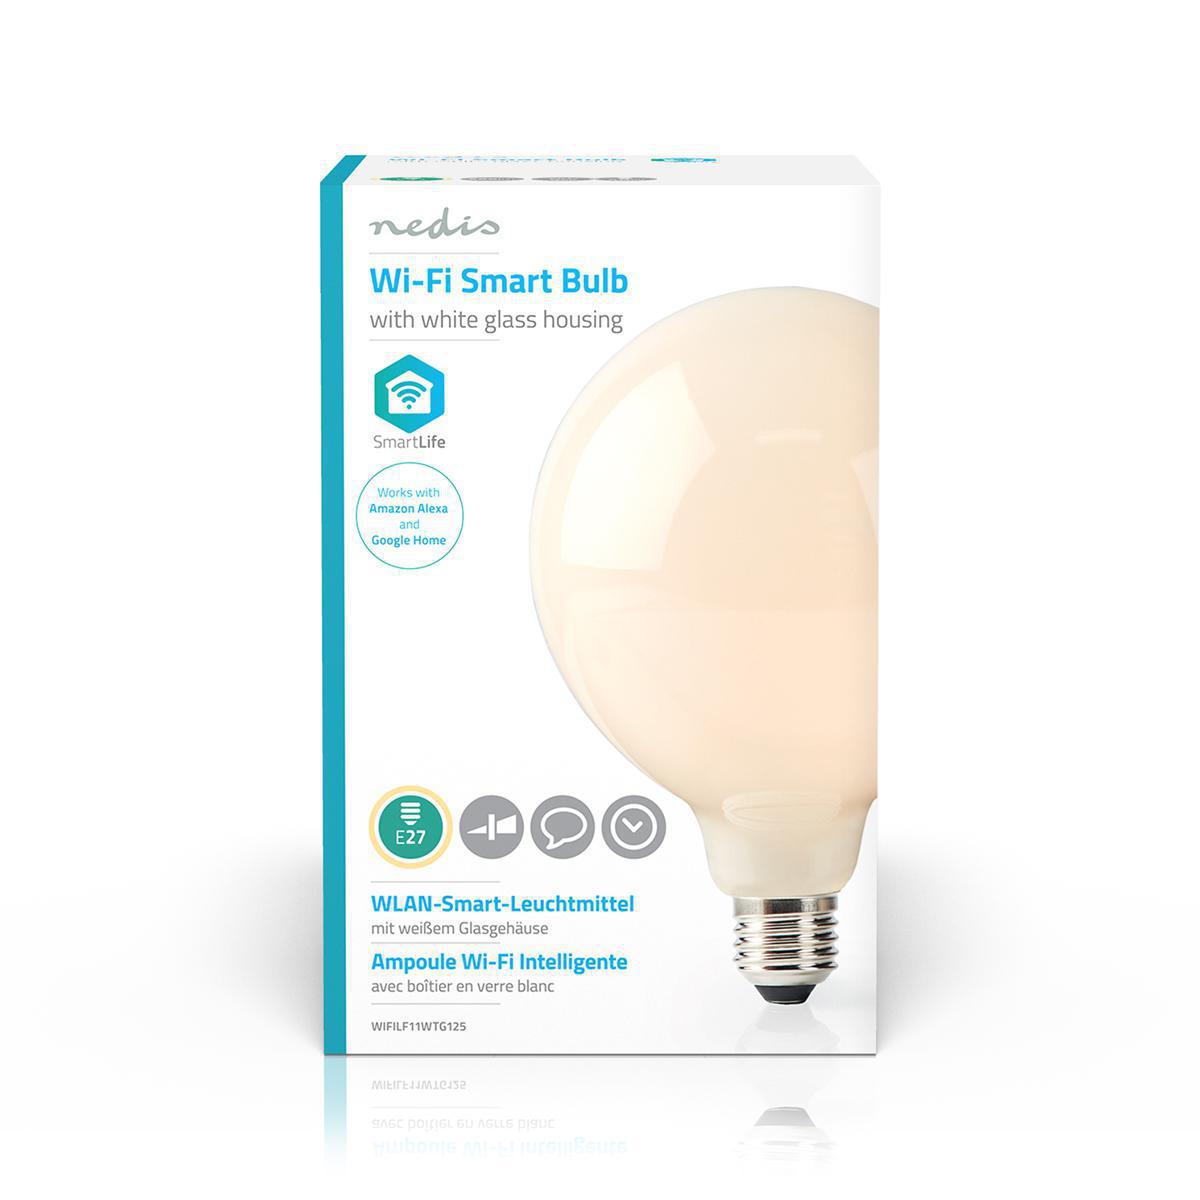 Smart lamp globe Led Lamp 5 Watt 2700K - Warm wit - voorkant verpakking